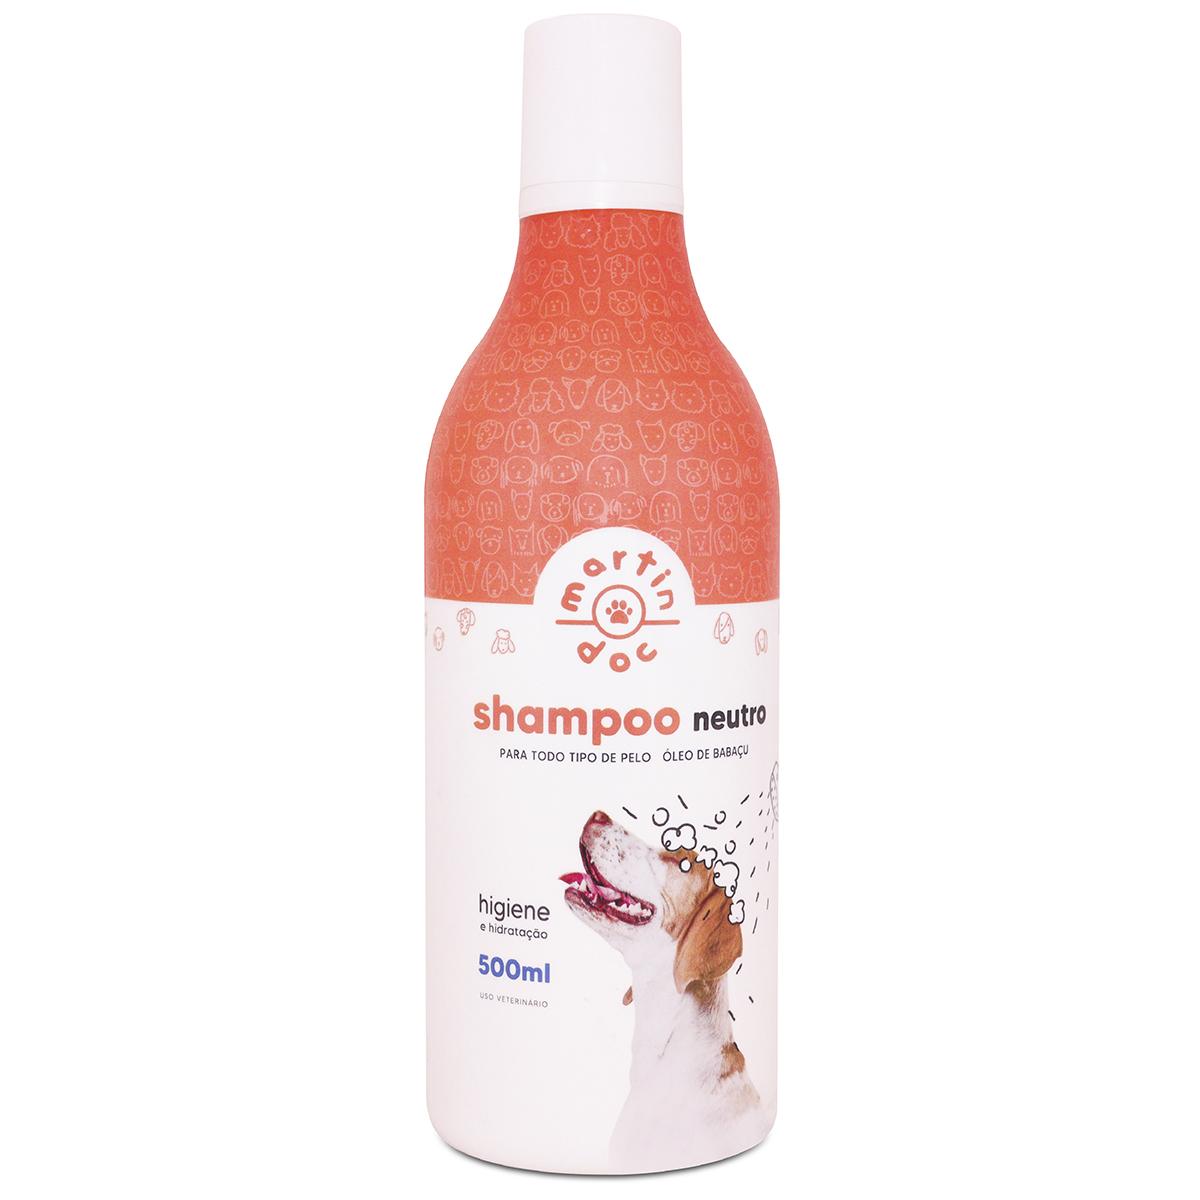 Shampoo Neutro Martindoc 500 ml